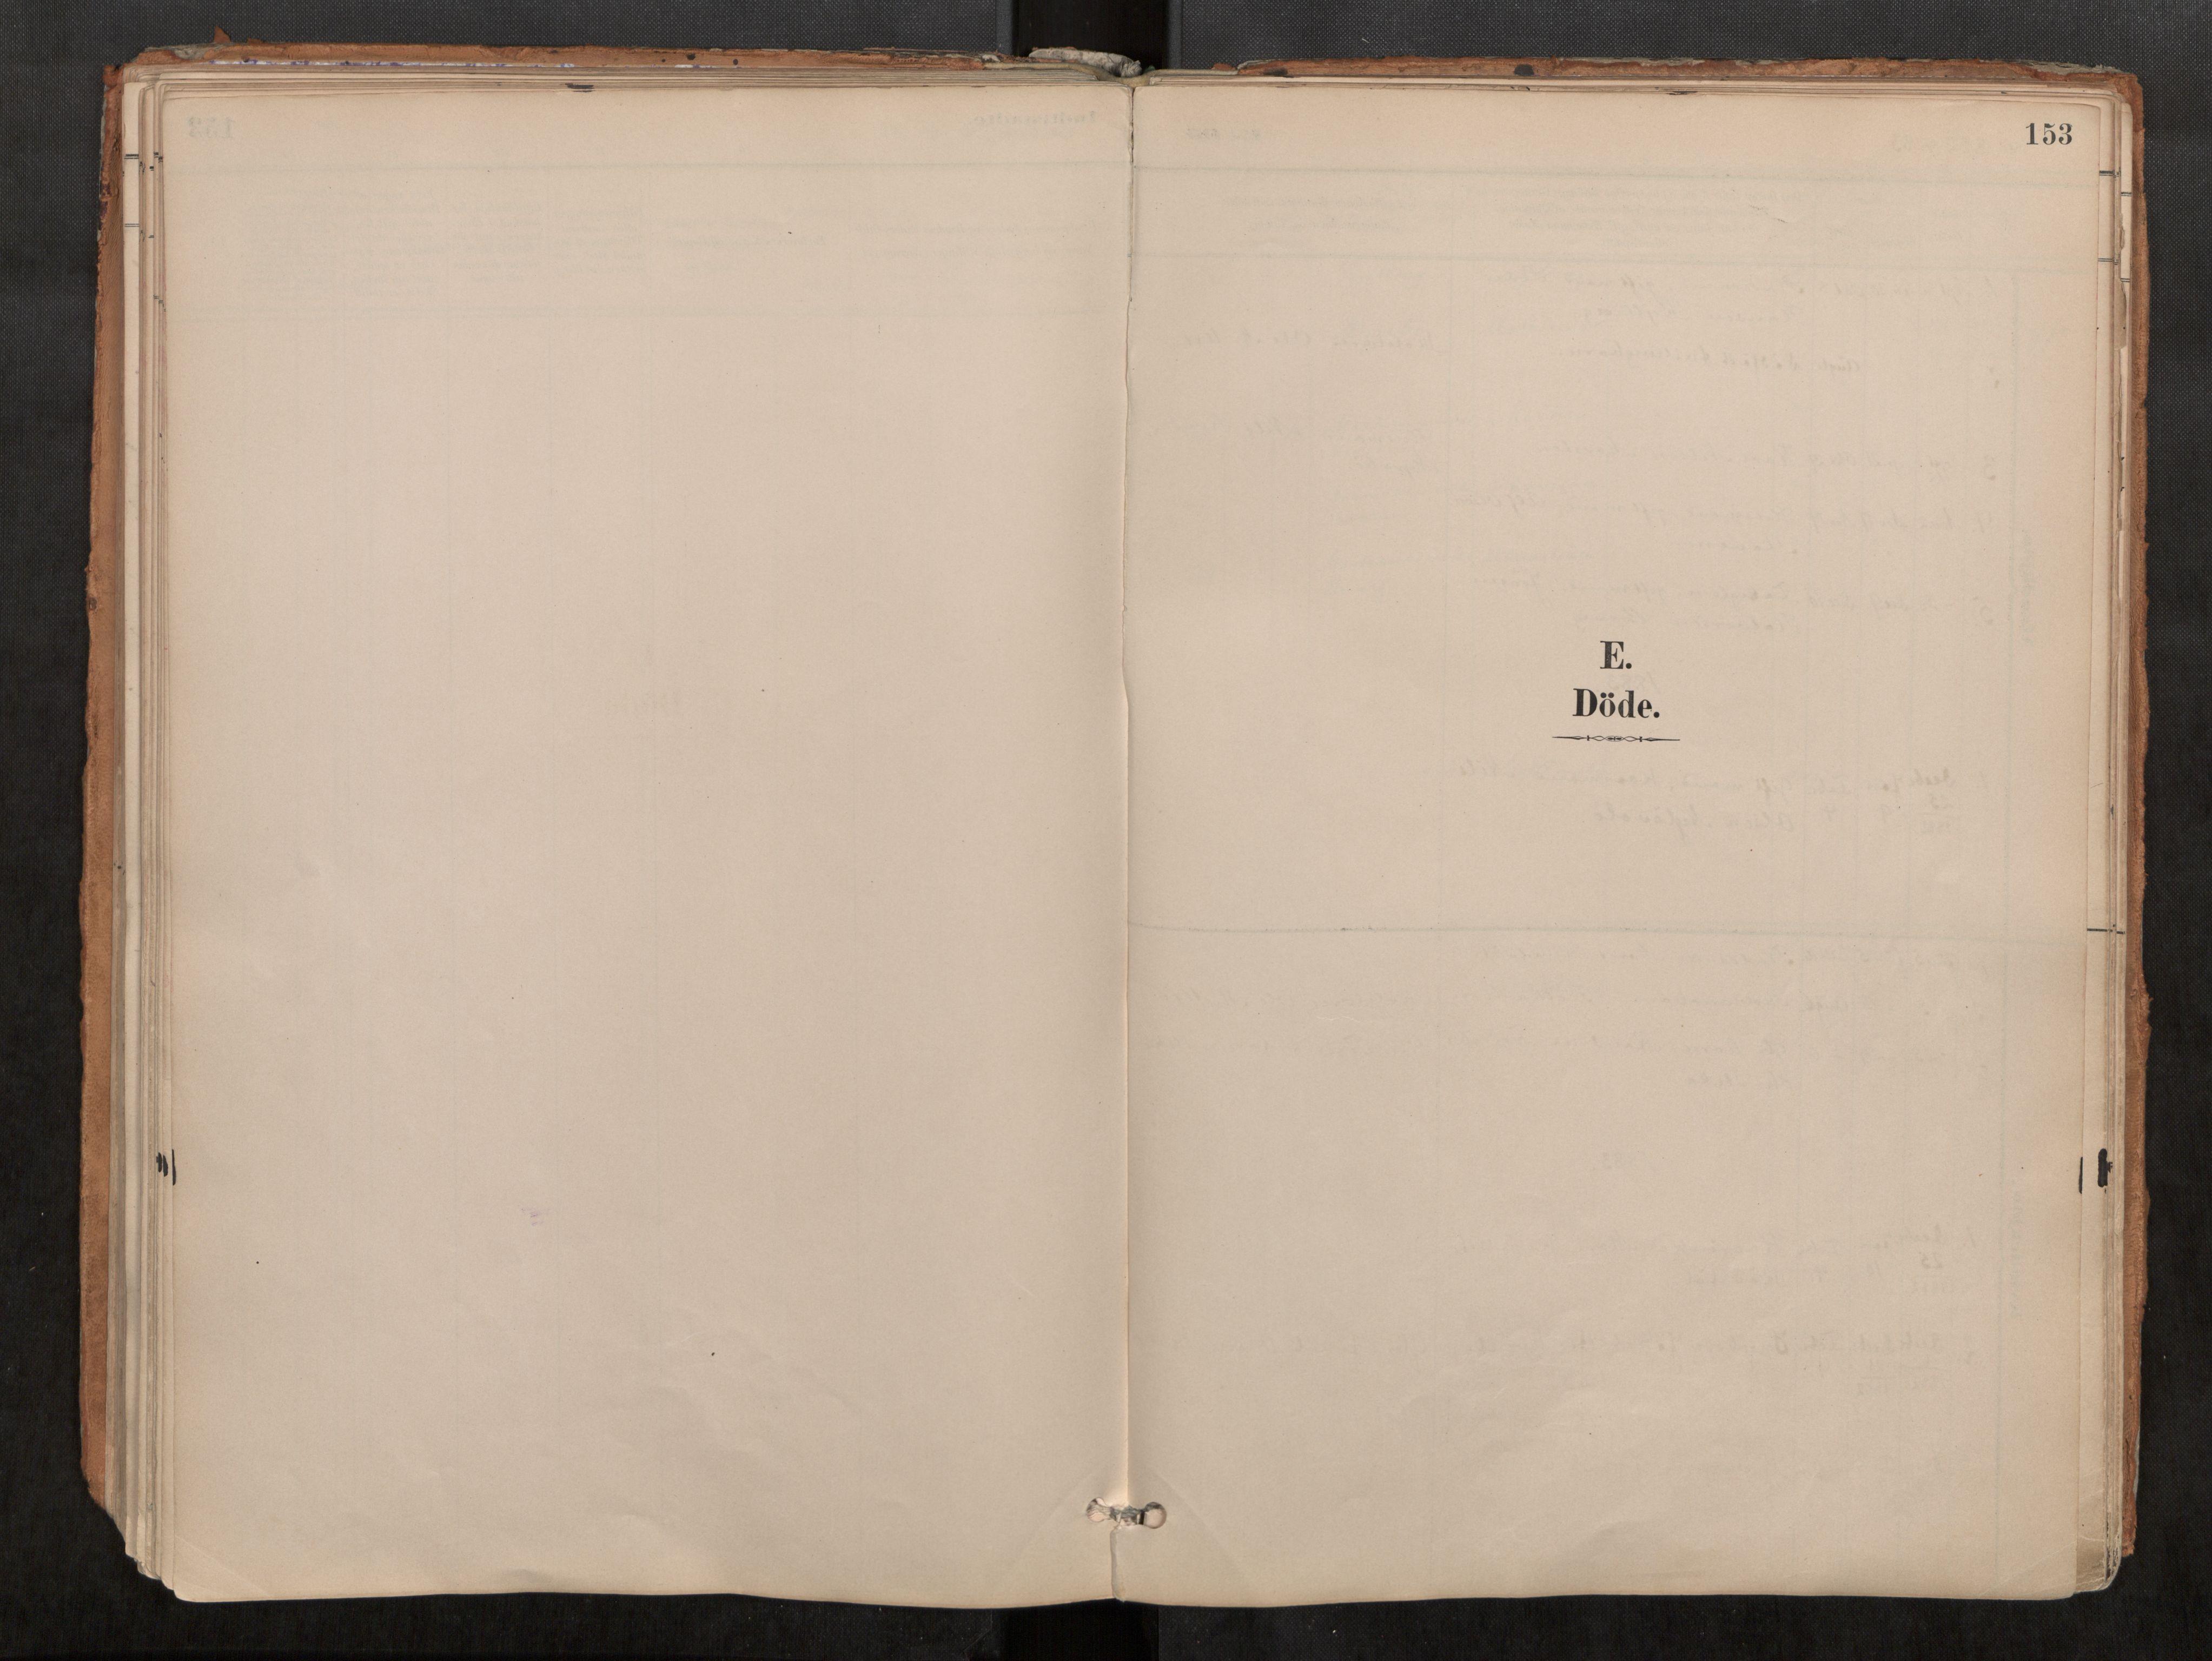 SAT, Grytten sokneprestkontor, Ministerialbok nr. 546A03, 1882-1920, s. 153